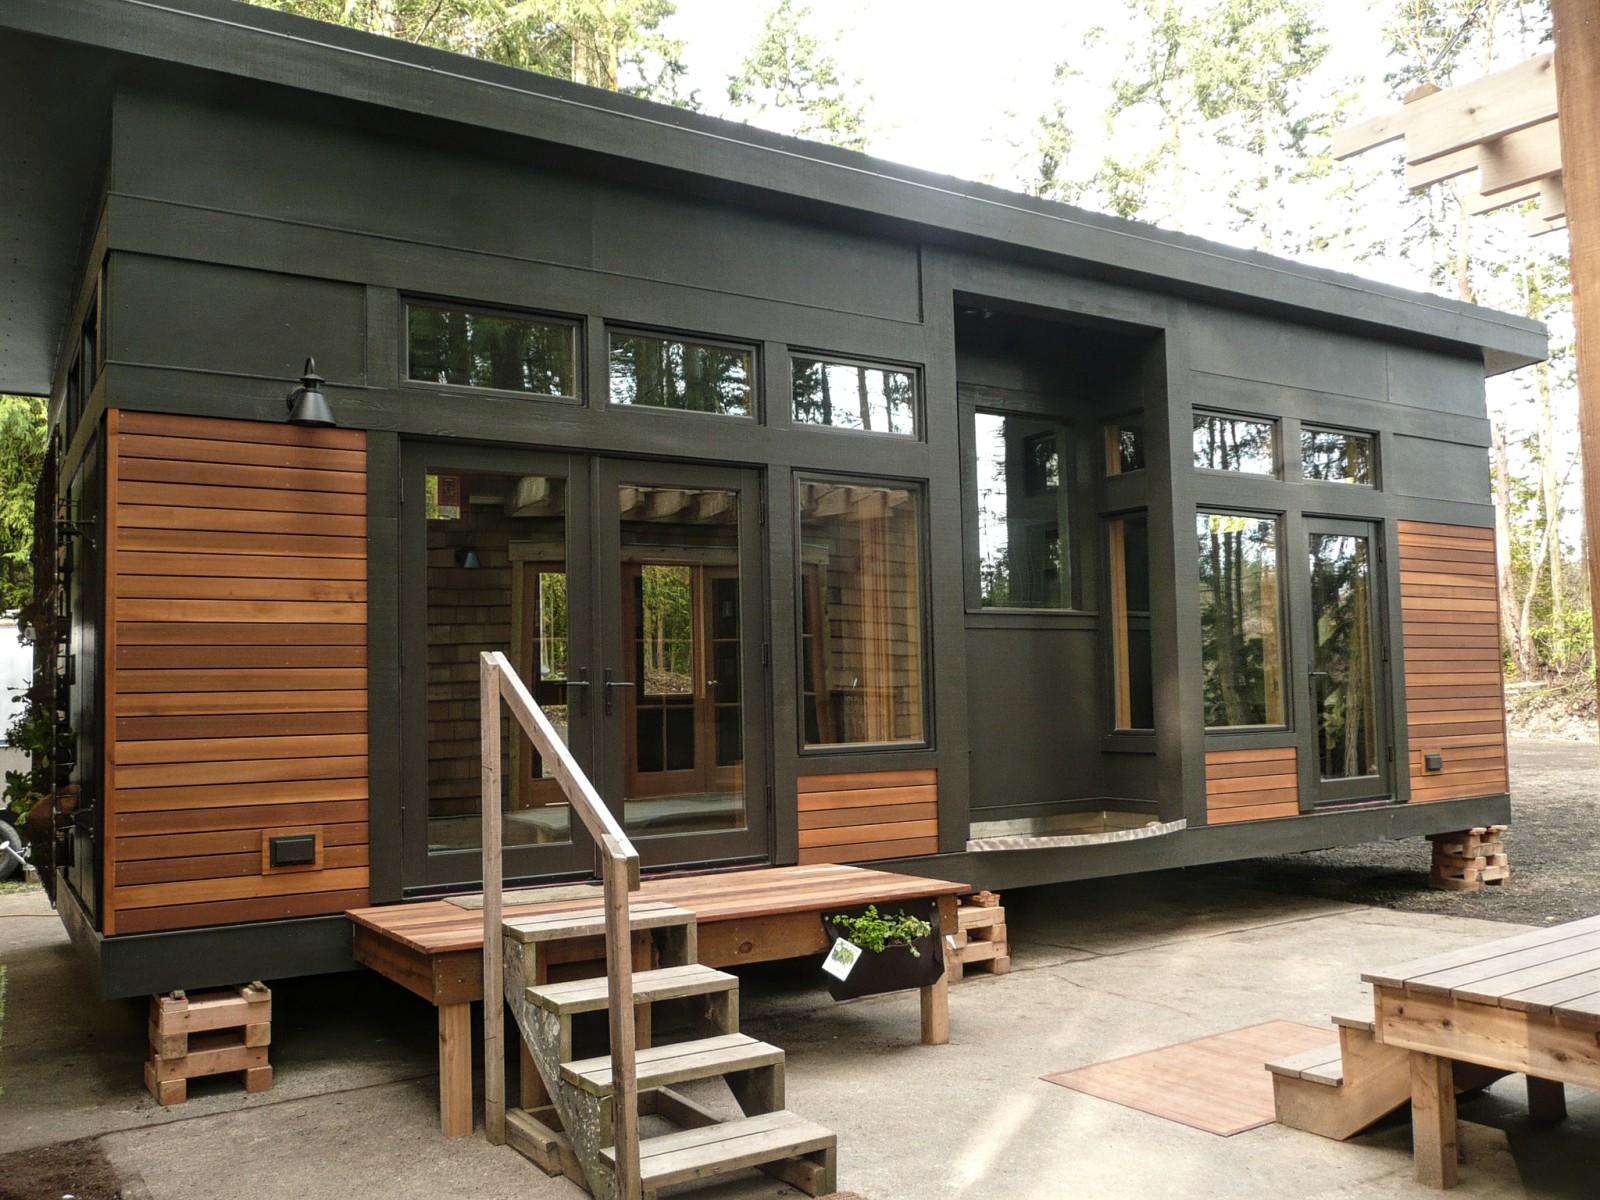 The Waterhaus, a tiny sustainable prefab home | GreenPod